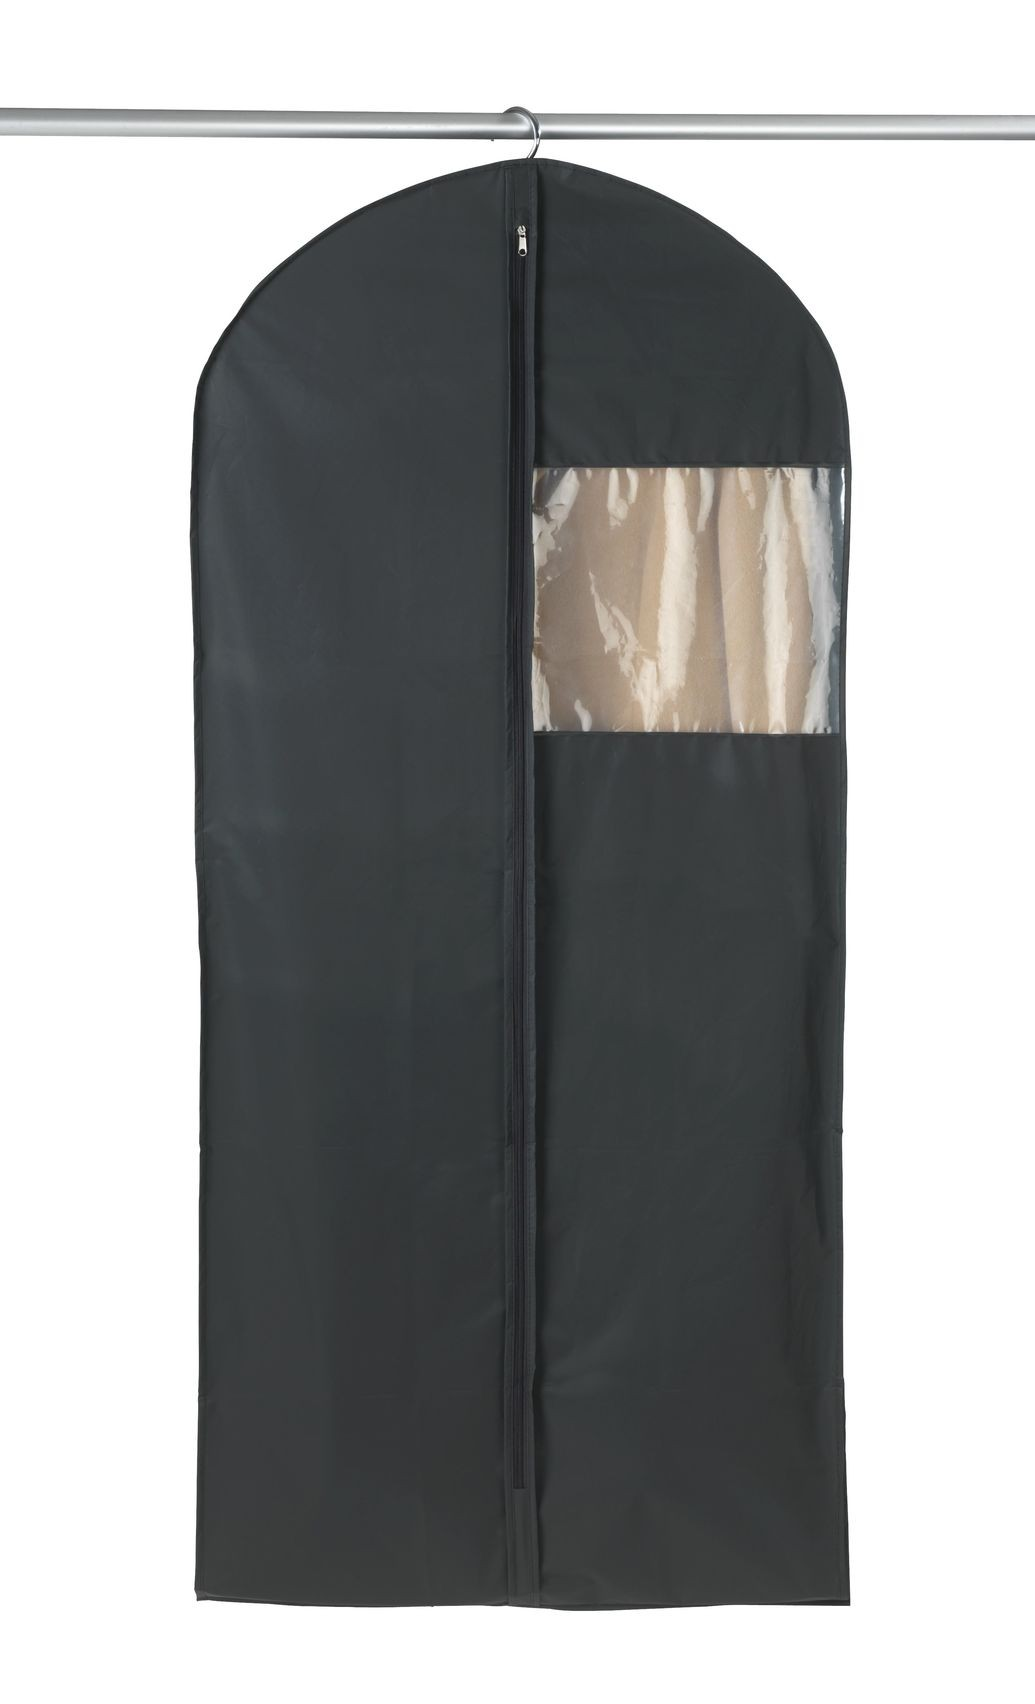 Wenko Kleidersack Deep Black Space, 3er Set, je 135x60x12 cm